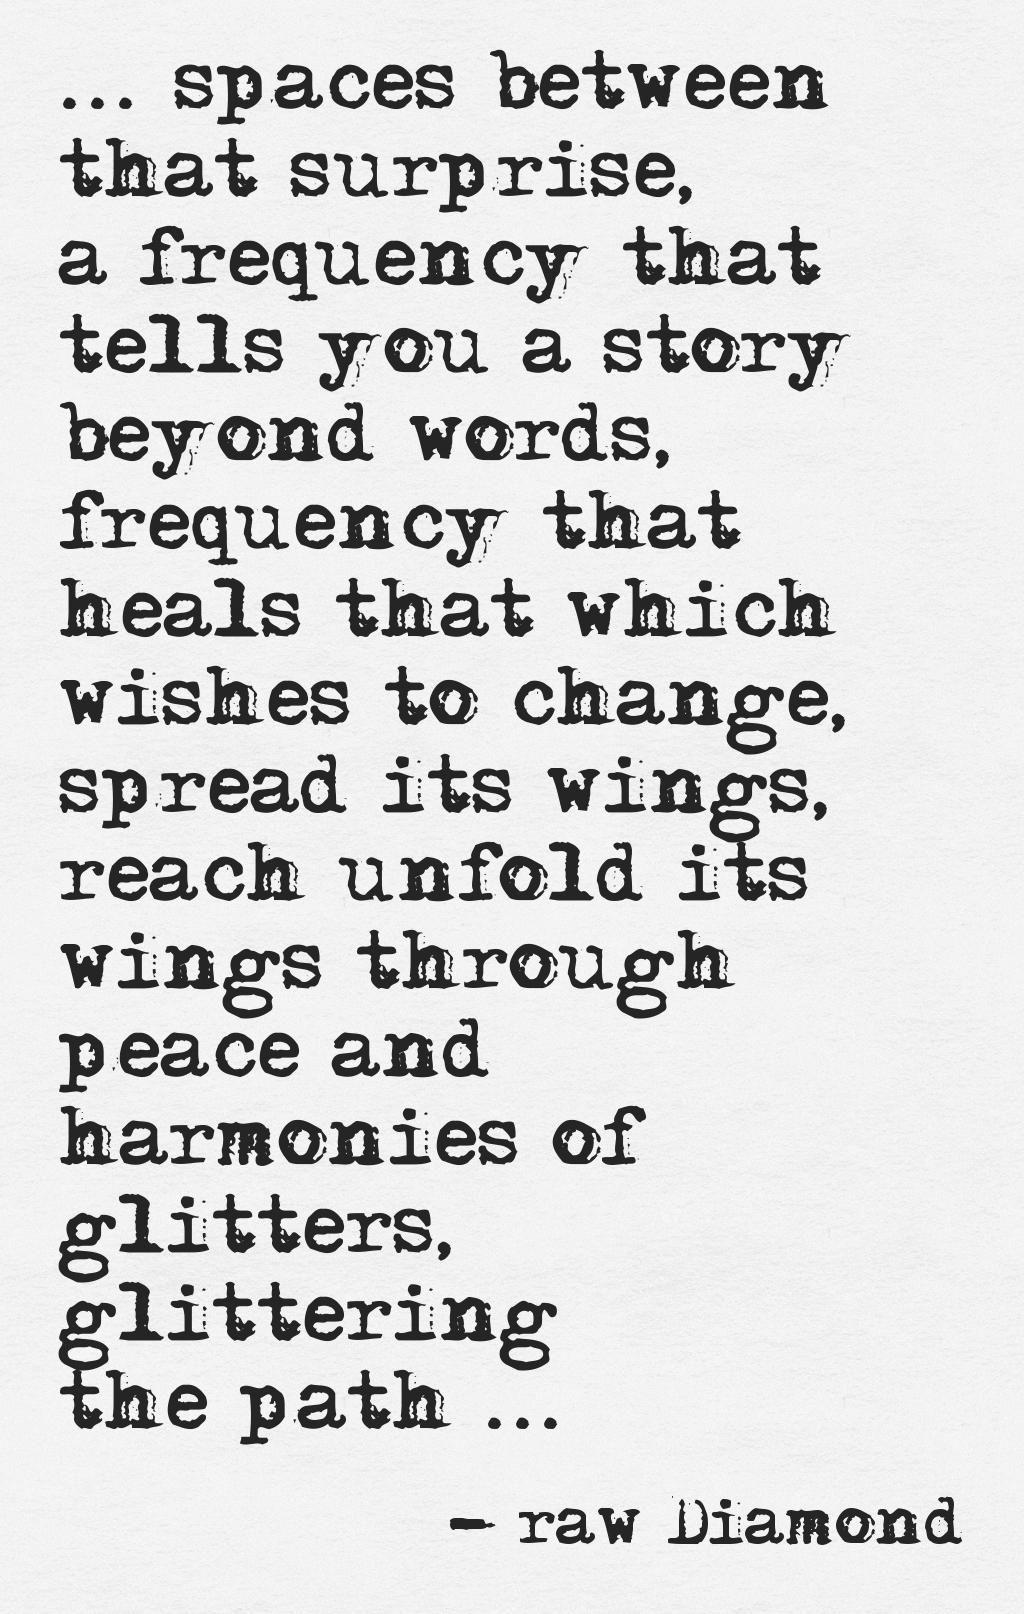 www.rawdiamondfacets.com #awareness #consciousness #beyond #light #healing #source #starwings #melody #harmony #rawdiamond #facets #glitterway